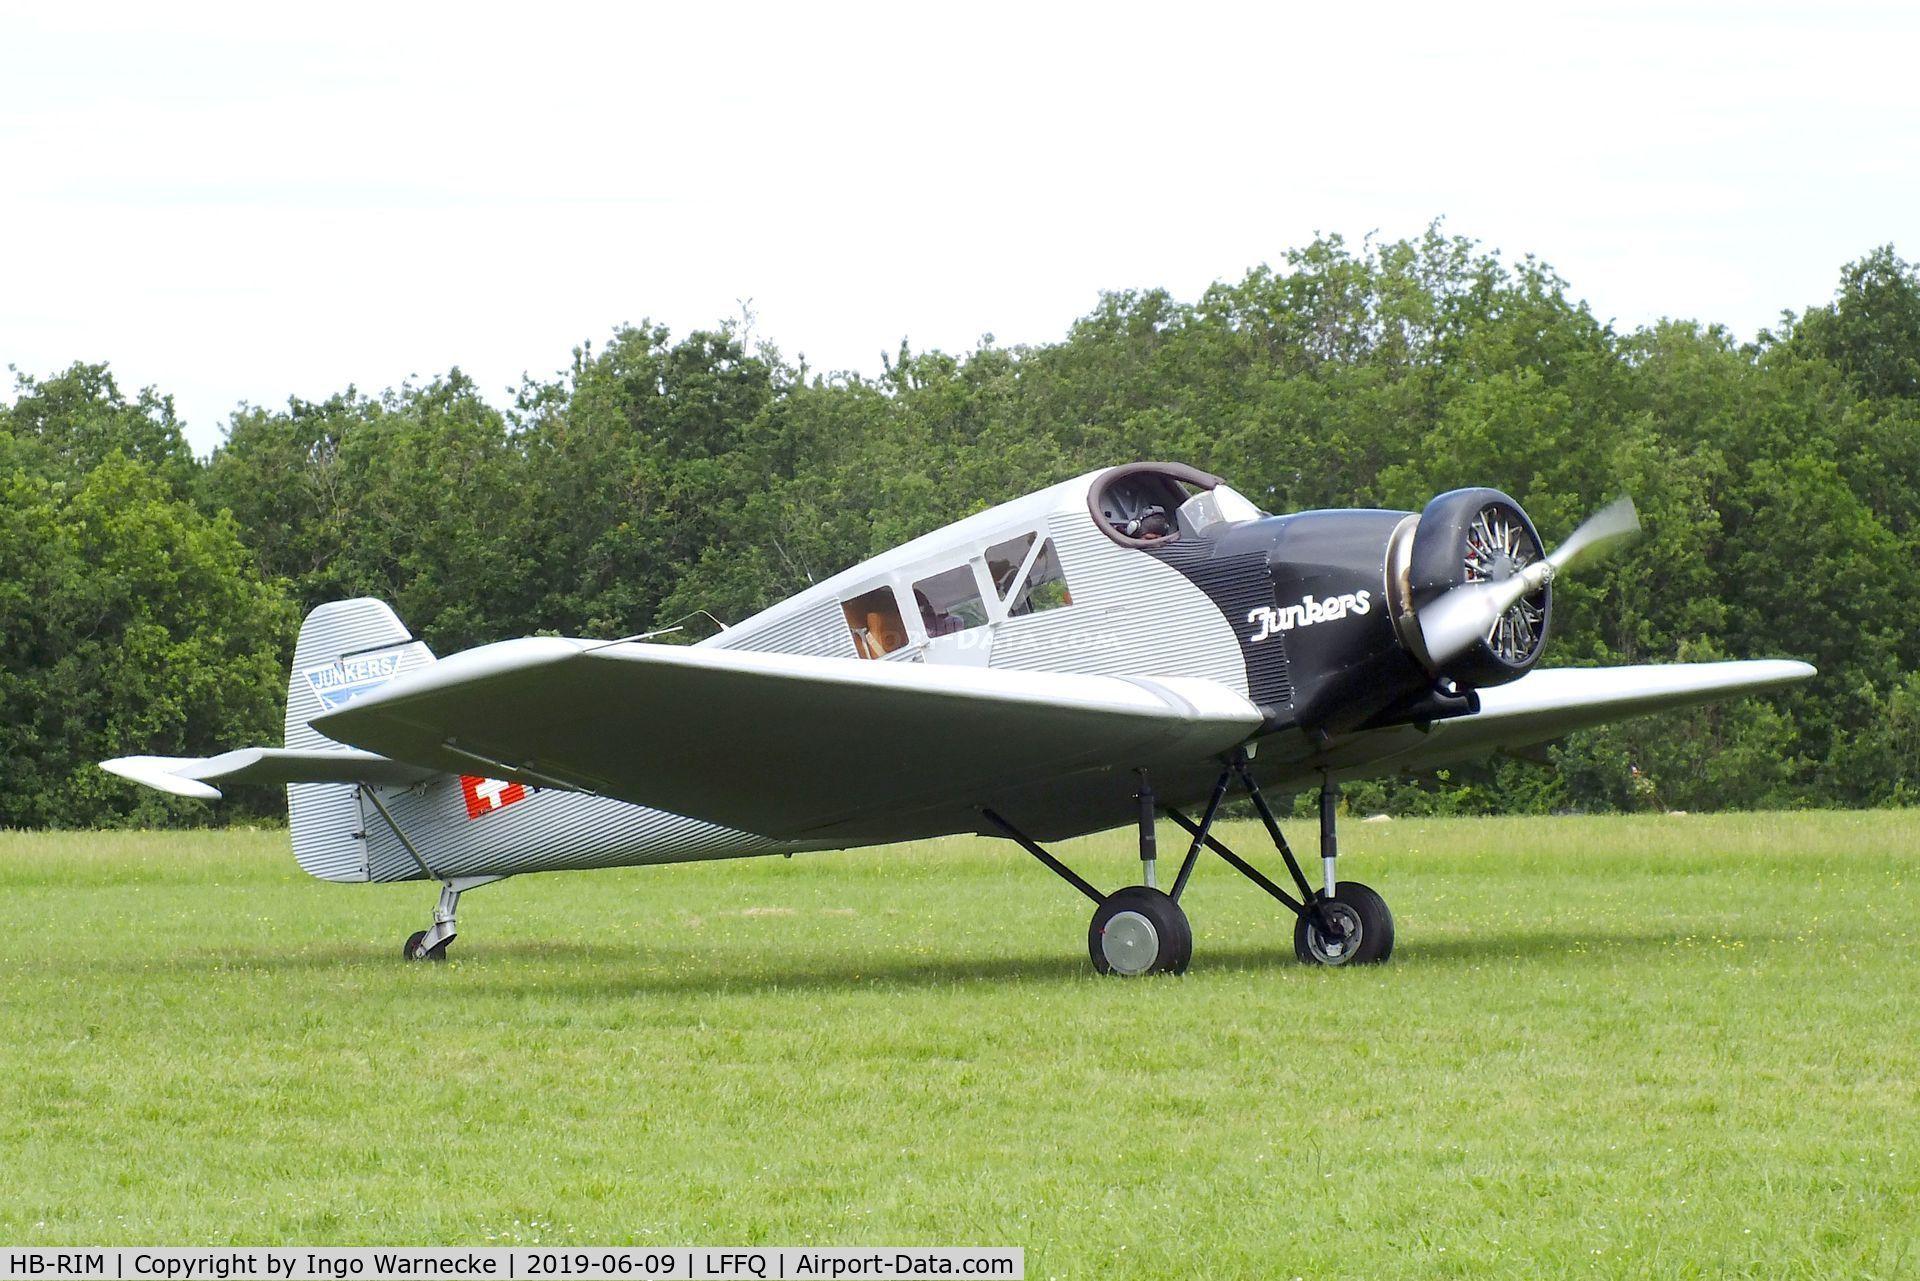 HB-RIM, 2015 Rimowa/Junkers F-13 C/N 1, Rimowa / Junkers F 13 replica (with radial engine) at the Meeting Aerien 2019, La-Ferte-Alais